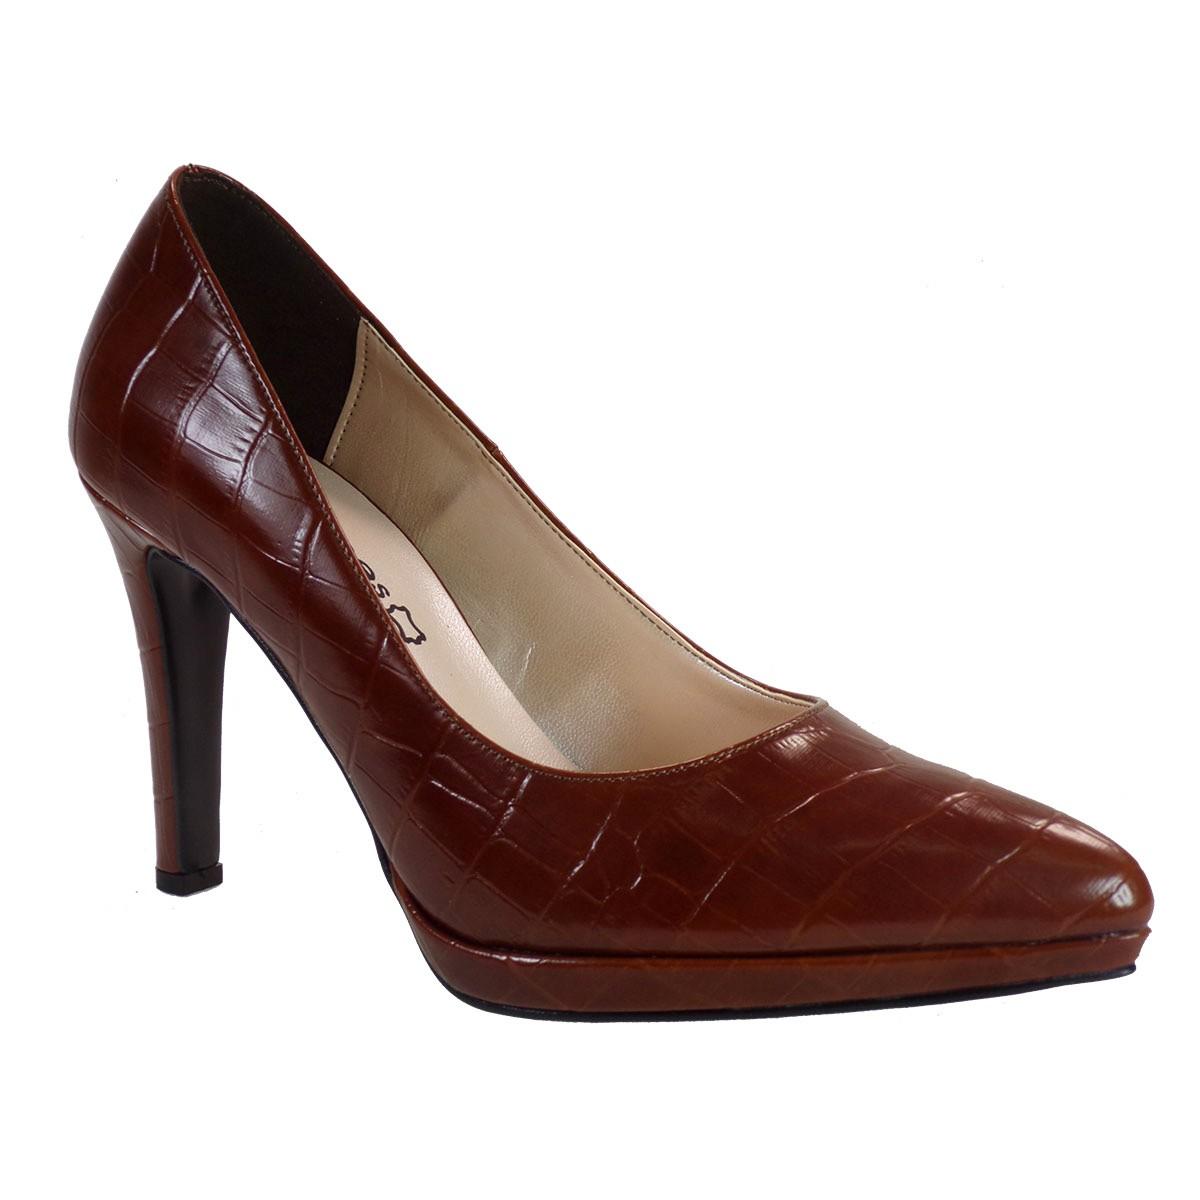 Katia Shoes Γυναικεία Παπούτσια Γόβες ΑΓΟΒΑ-1723 Ταμπά Κροκό